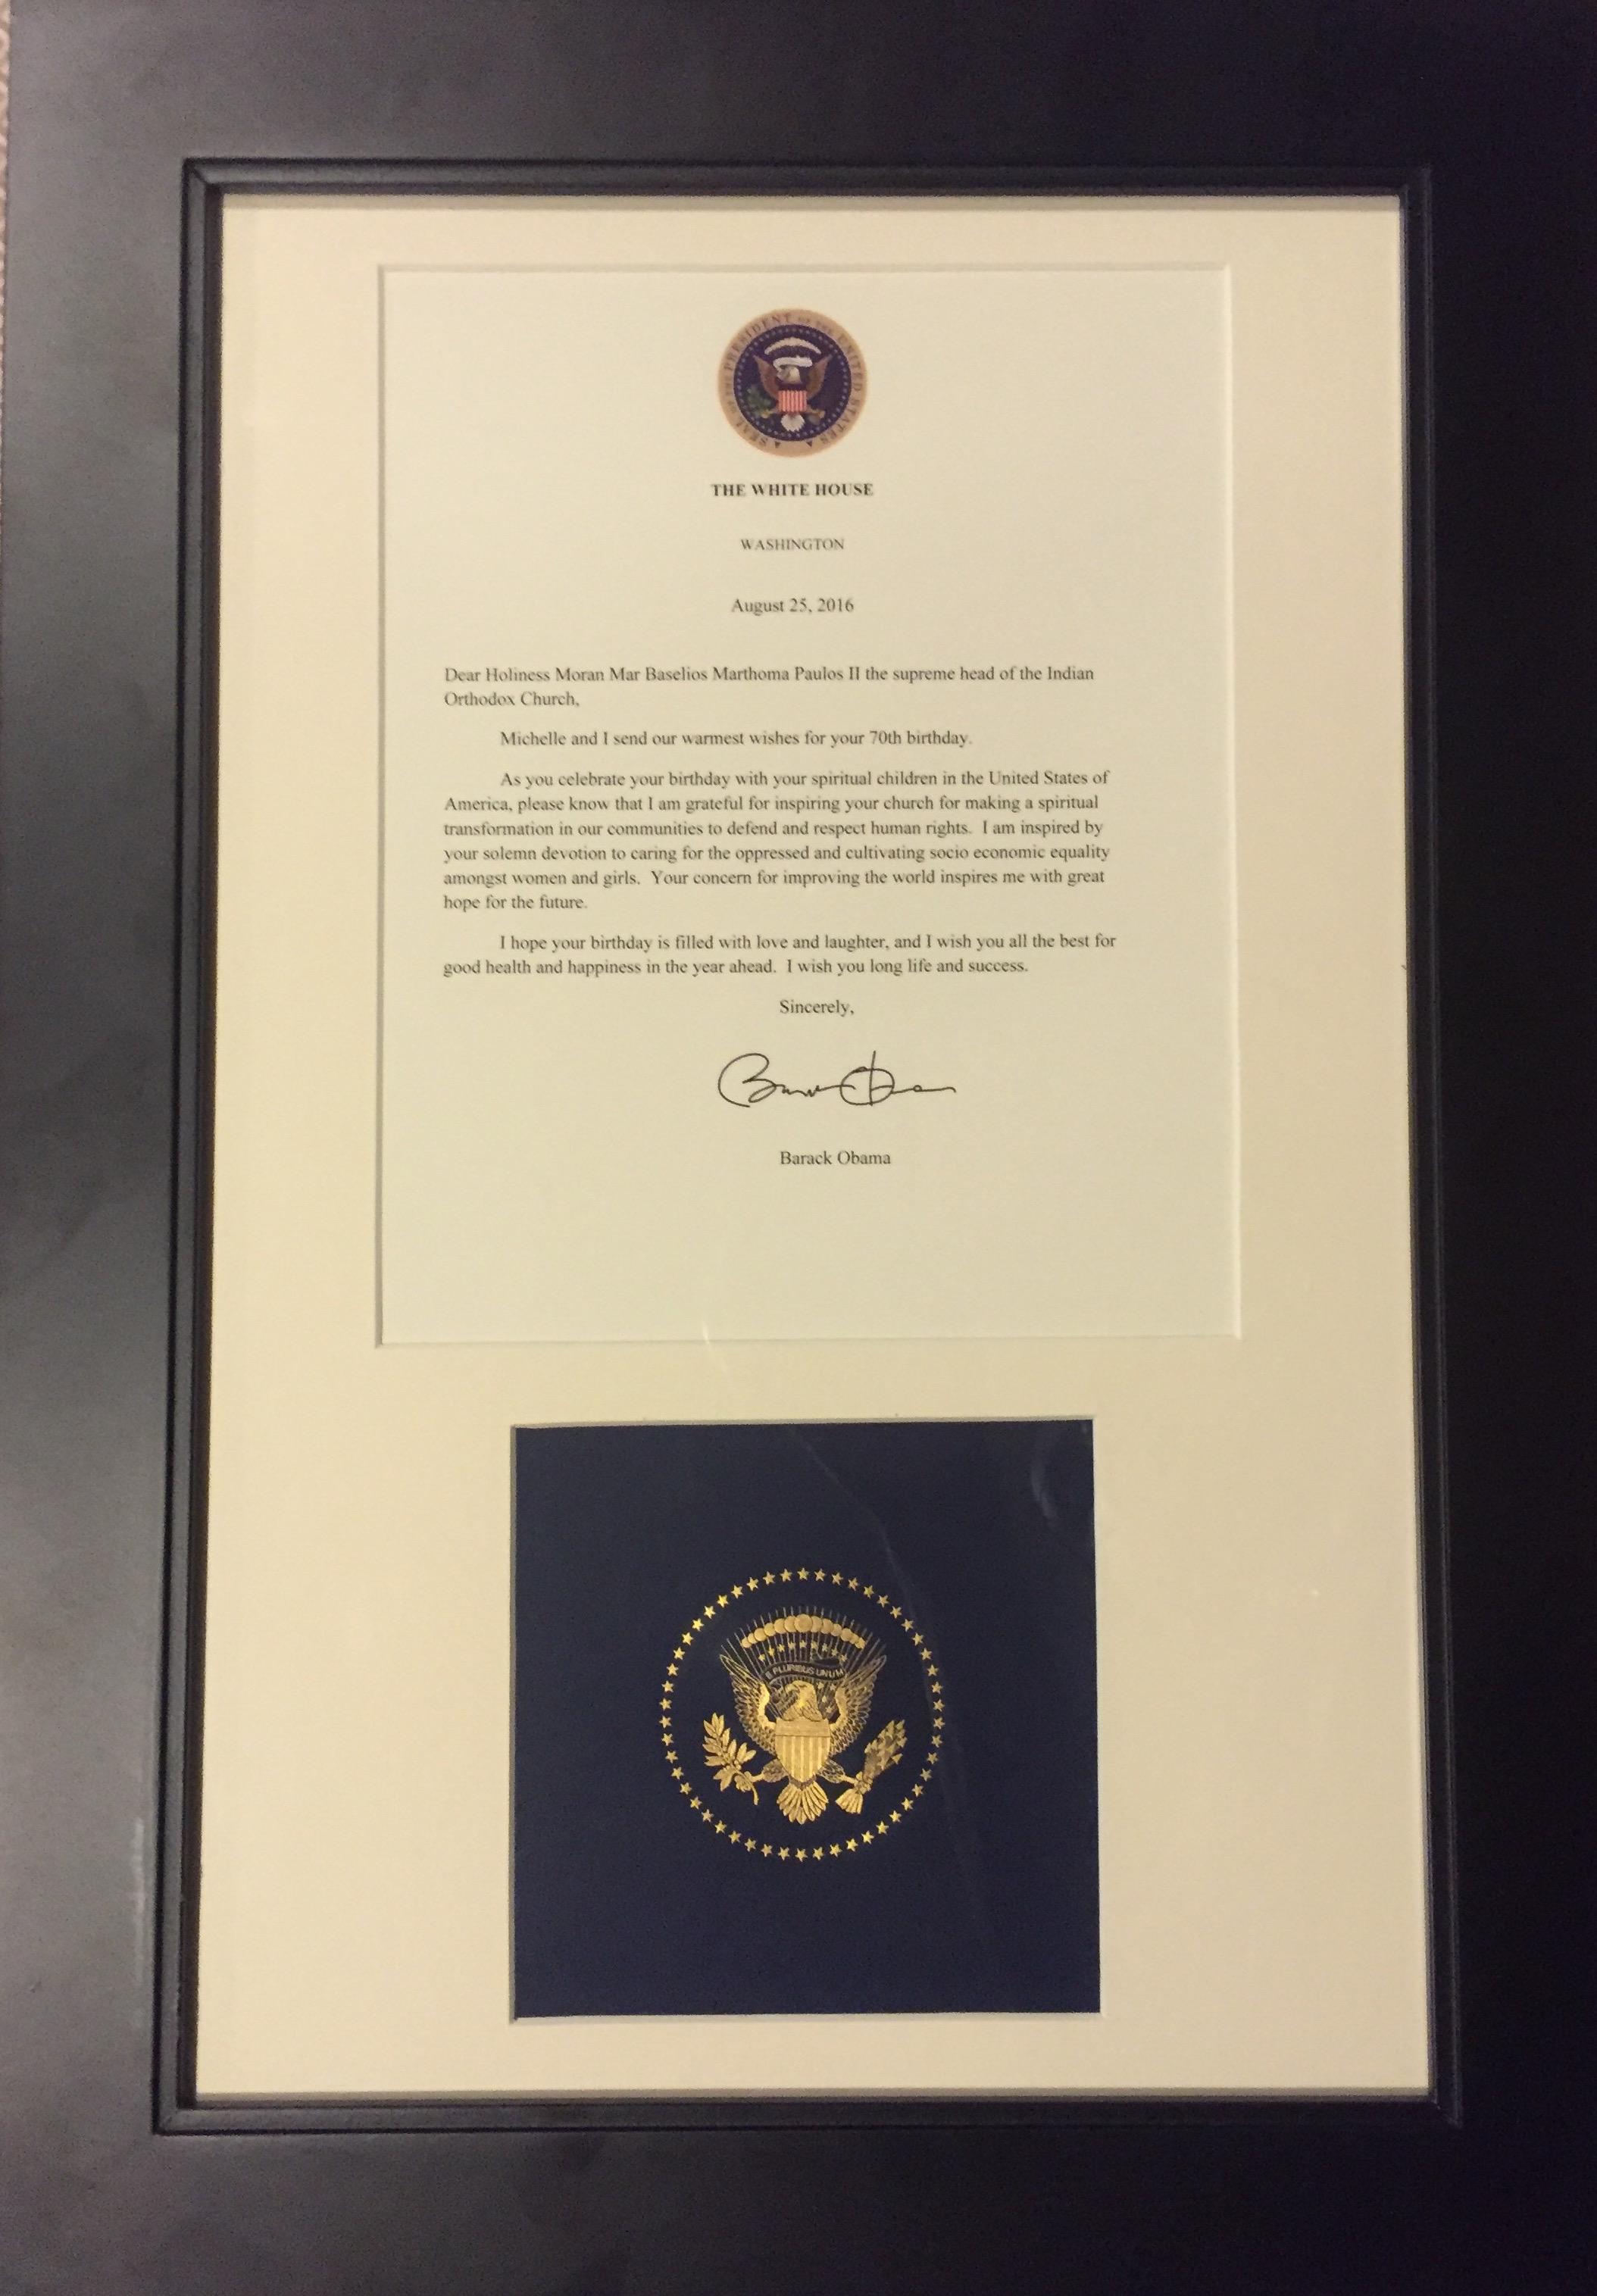 President Barak Obama Greets Catholicos Baselios Marthoma Paulos – Birthday Greeting from the President